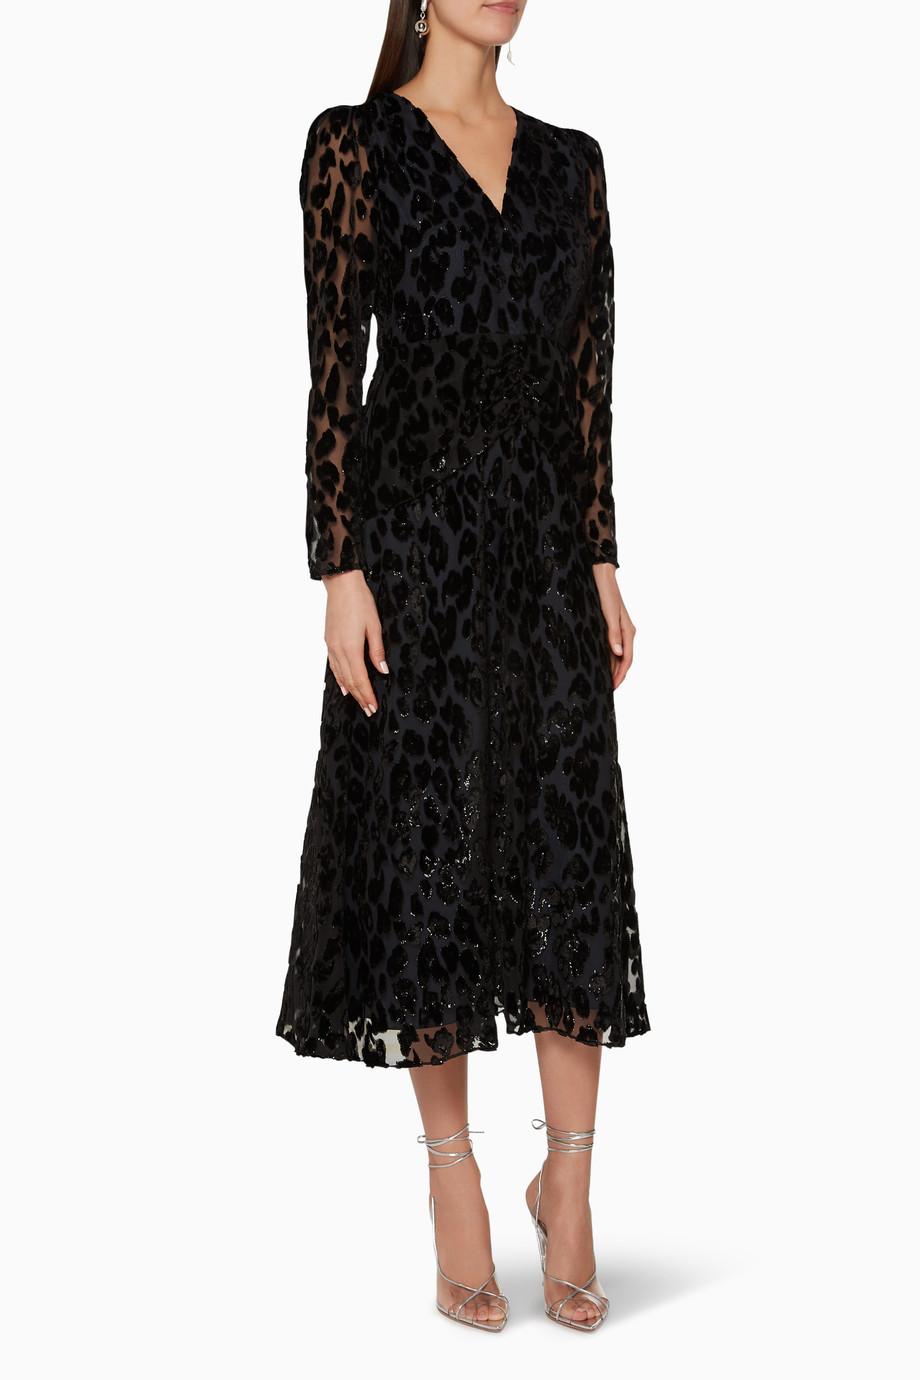 8aa2f046b719 Shop Self-Portrait Black Metallic Leopard Midi Dress for Women | Ounass